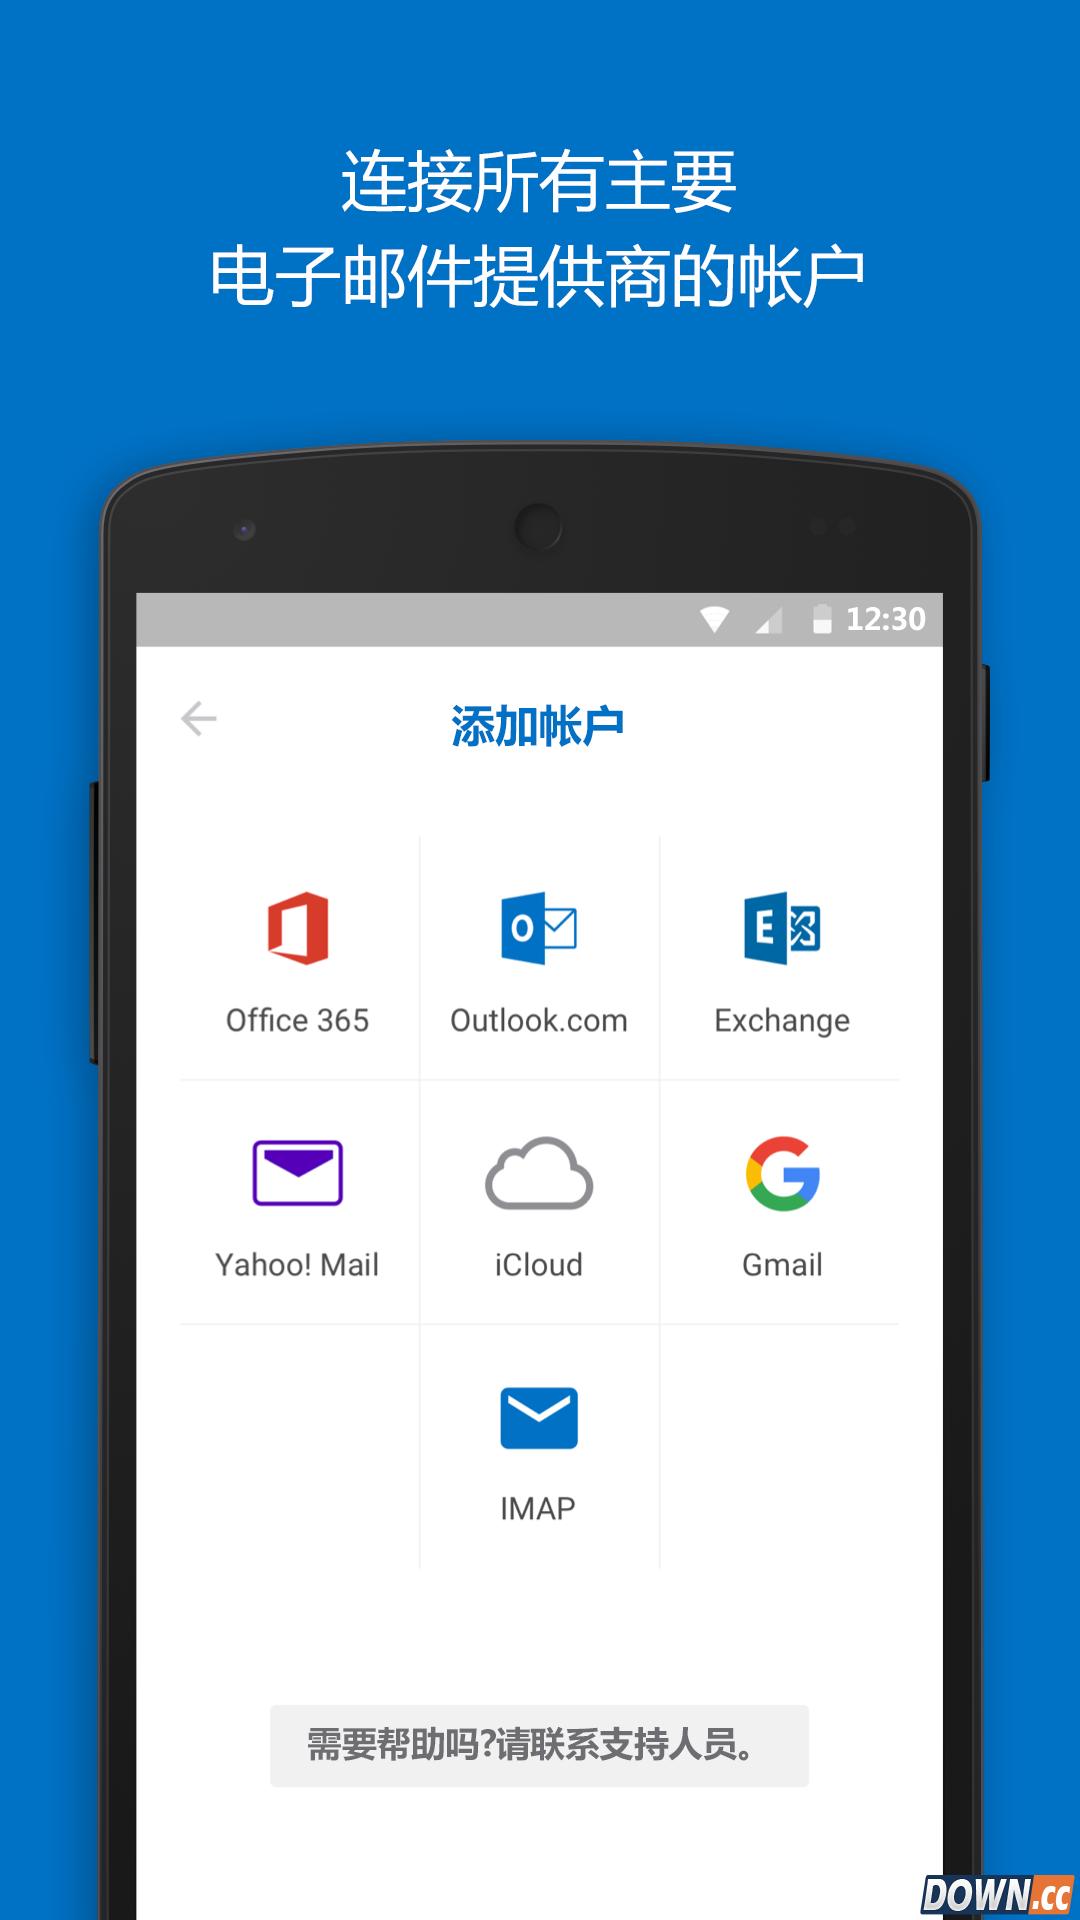 Outlook下载 Outlook2.0.24安卓手机版下载 酷易软件园